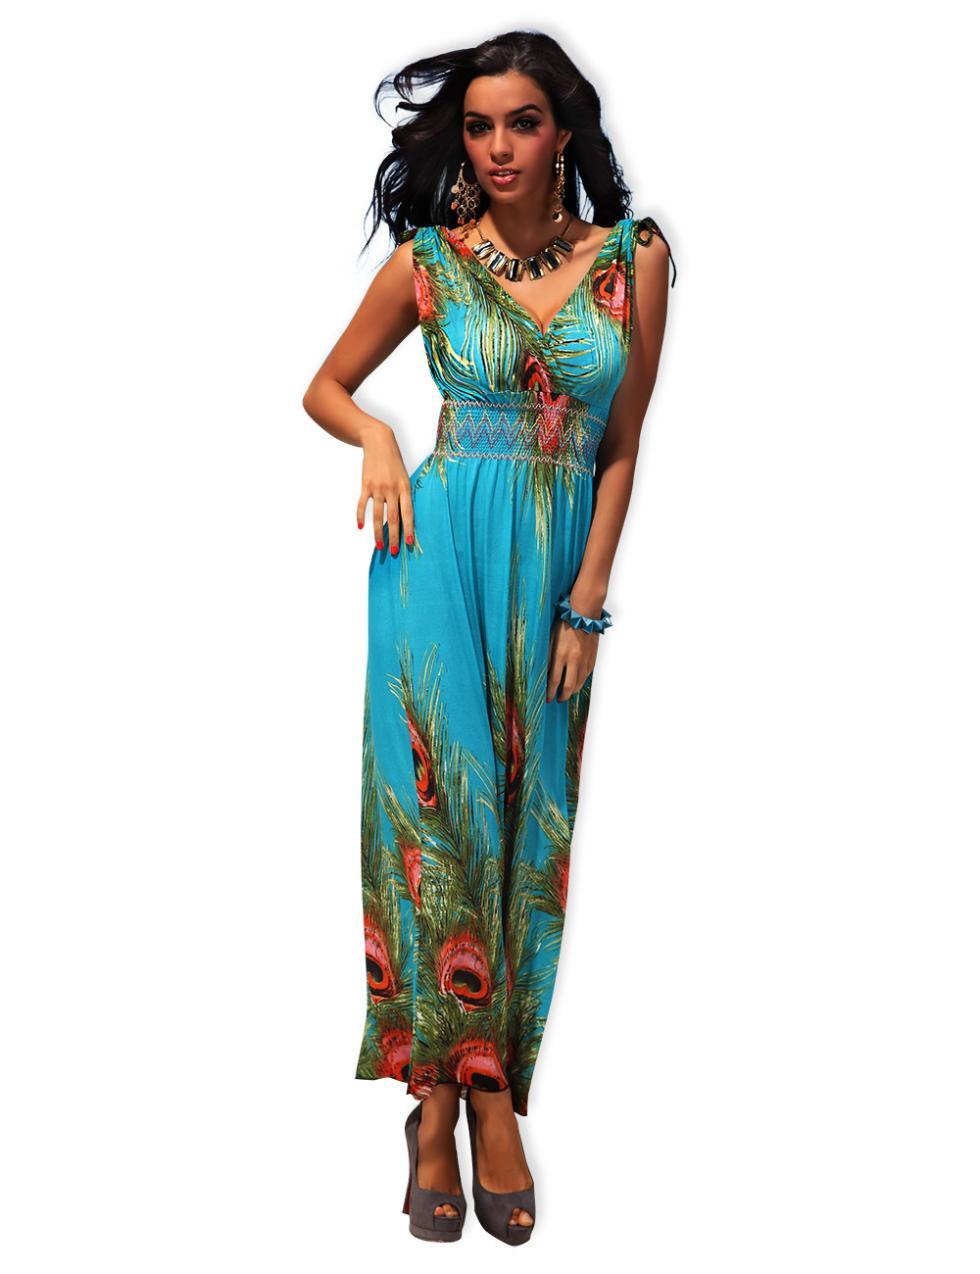 women summer dress 2014 hot selling sexy new wholesale